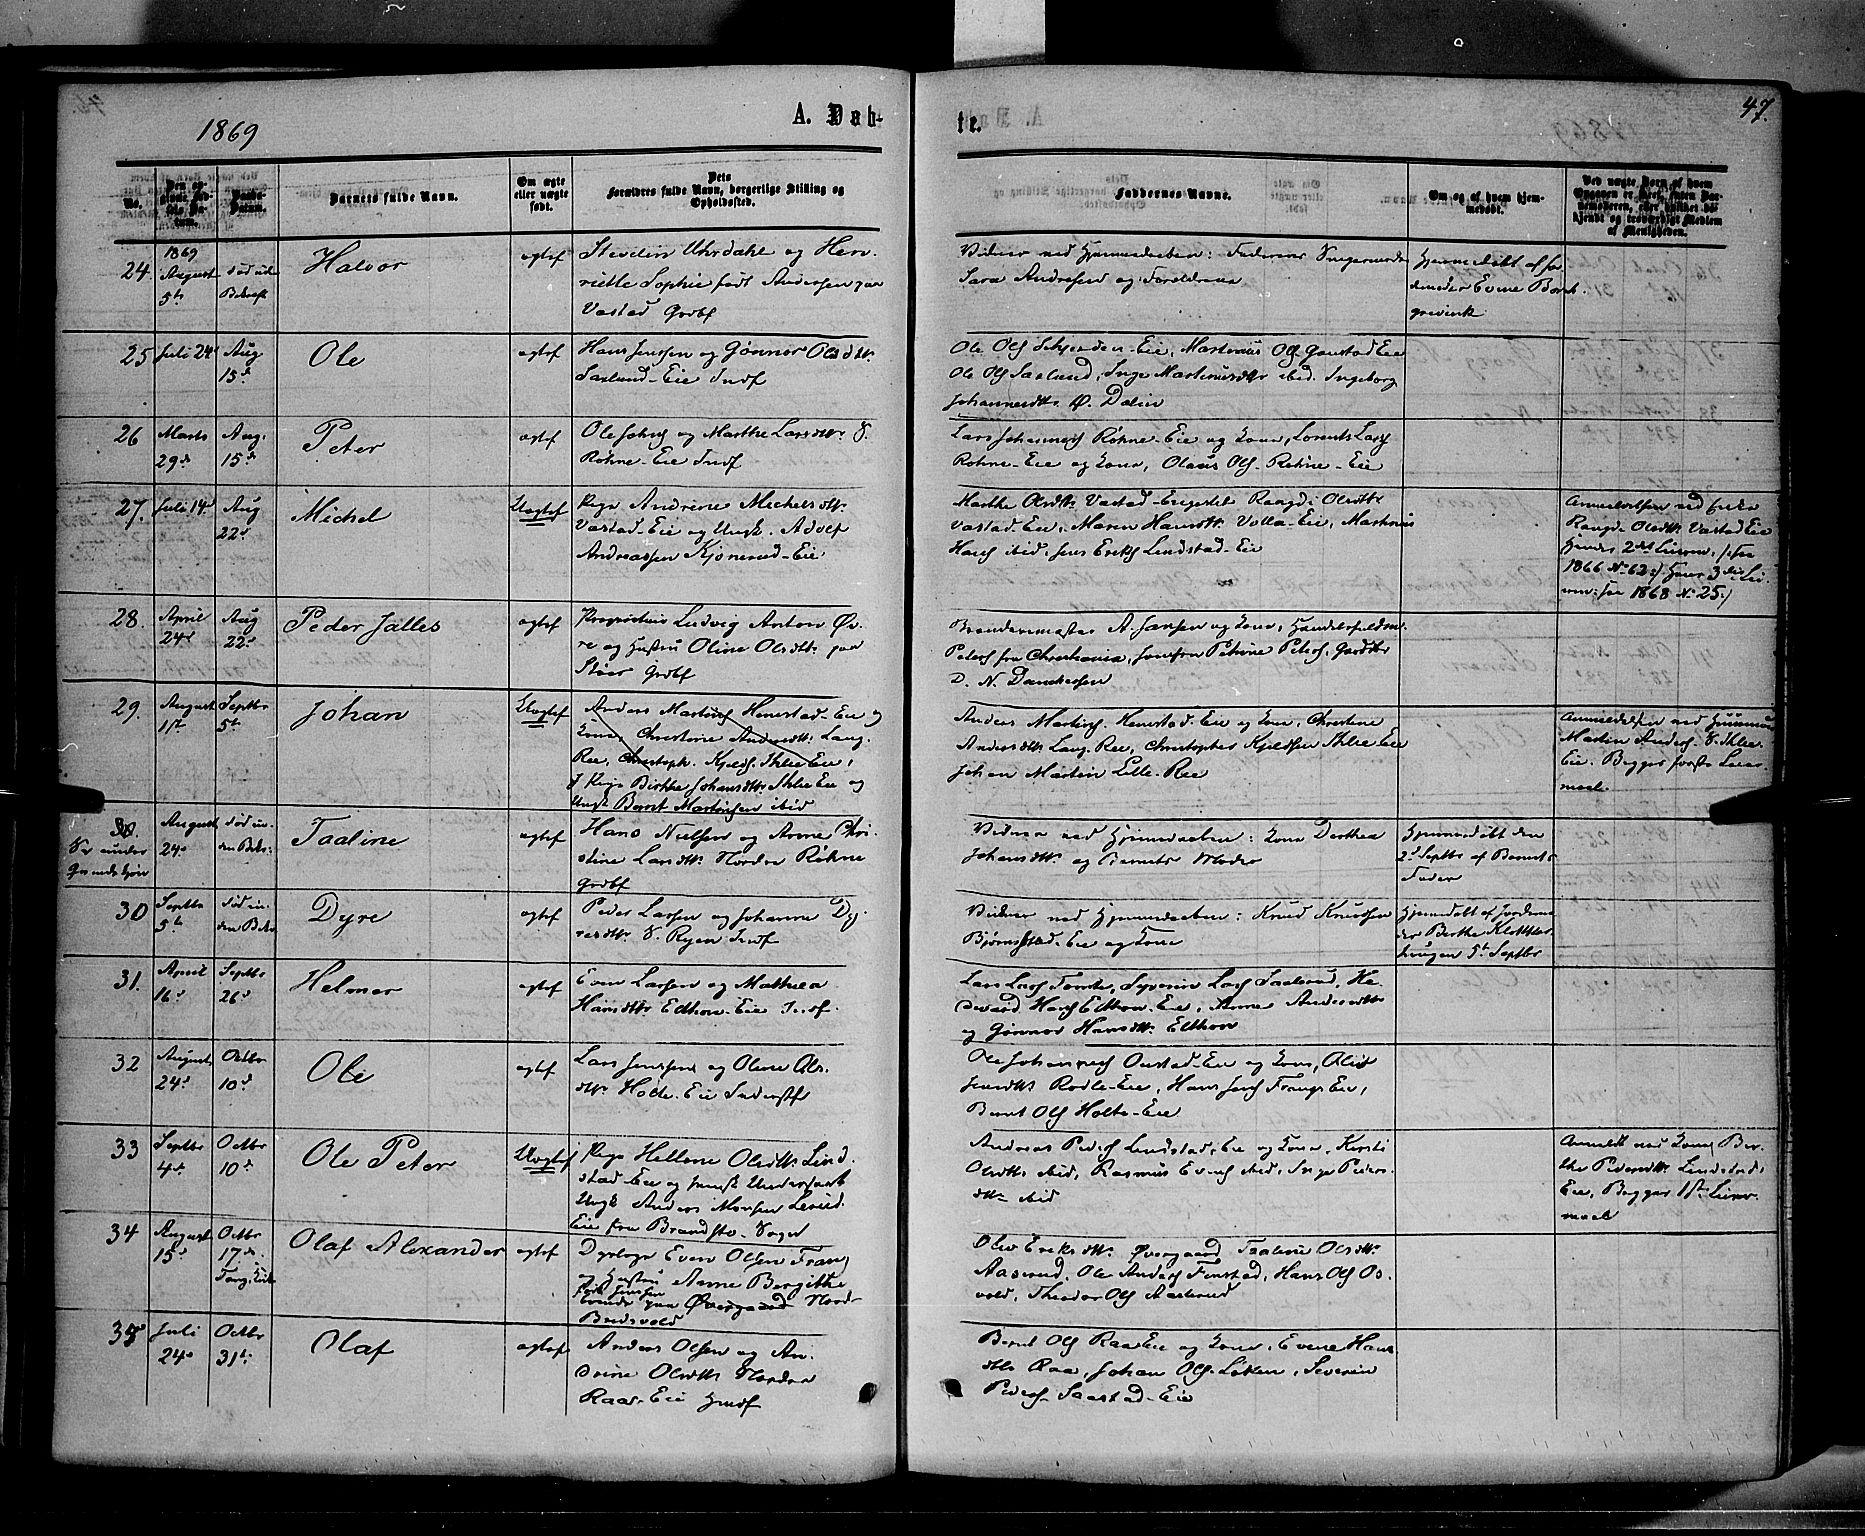 SAH, Stange prestekontor, K/L0013: Ministerialbok nr. 13, 1862-1879, s. 47